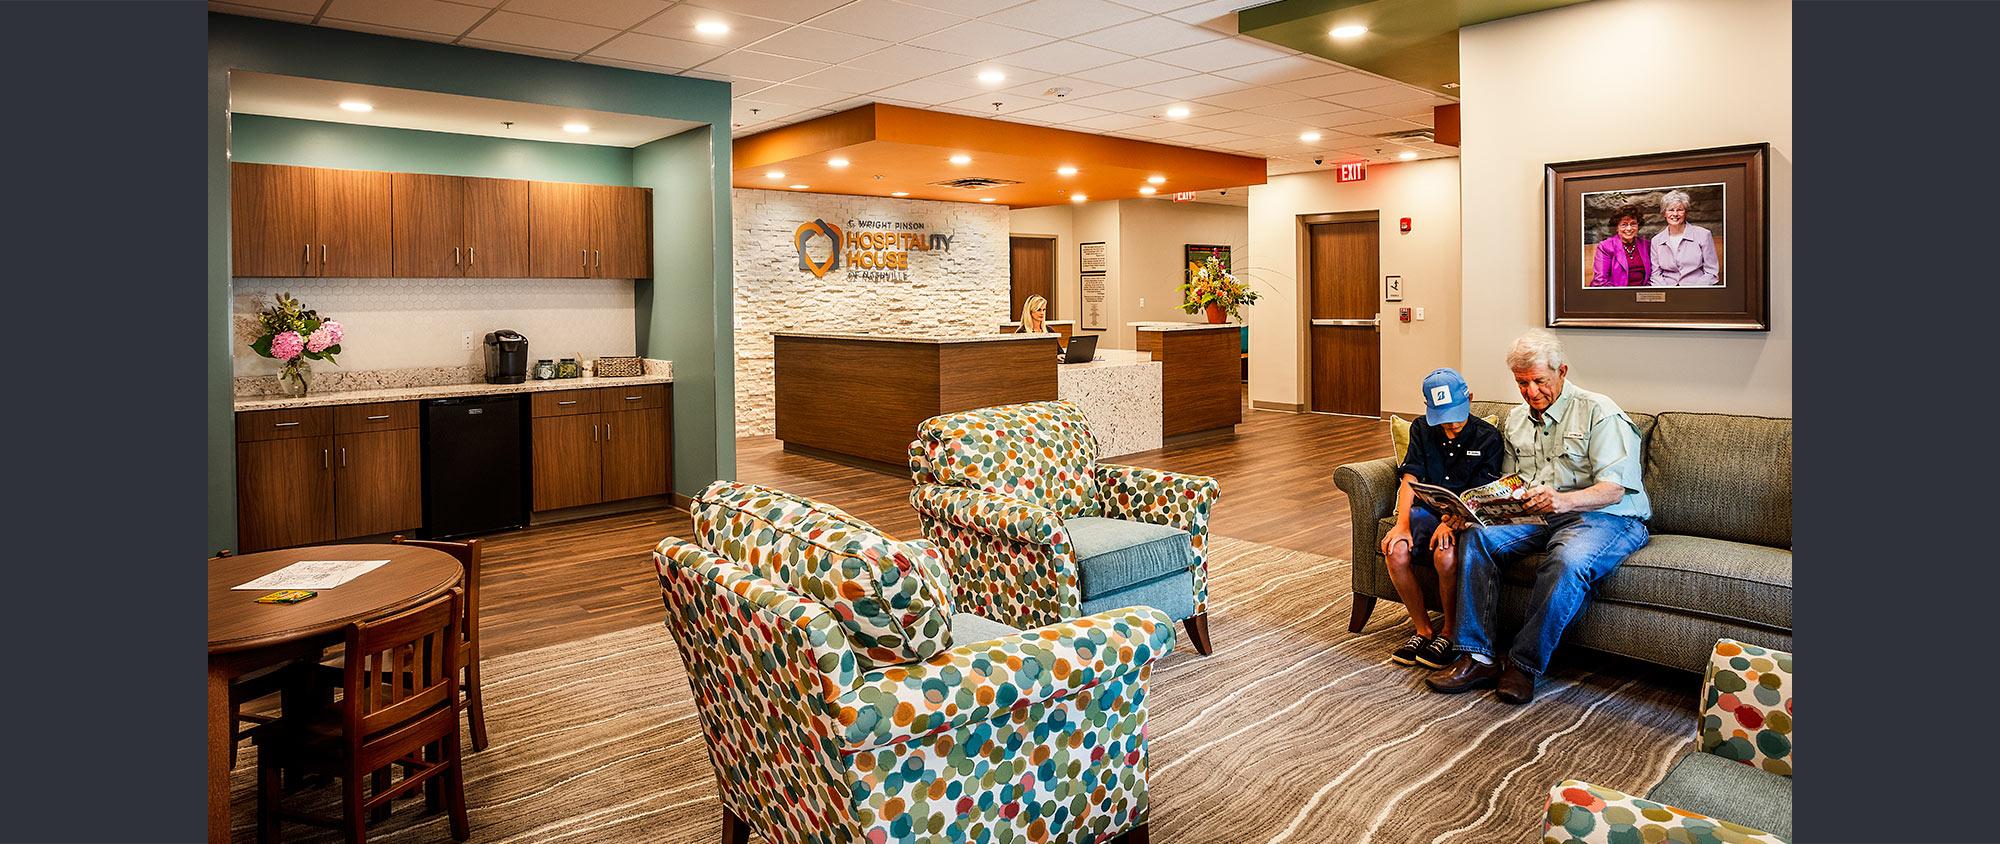 Pinson Hospital Hospitality House